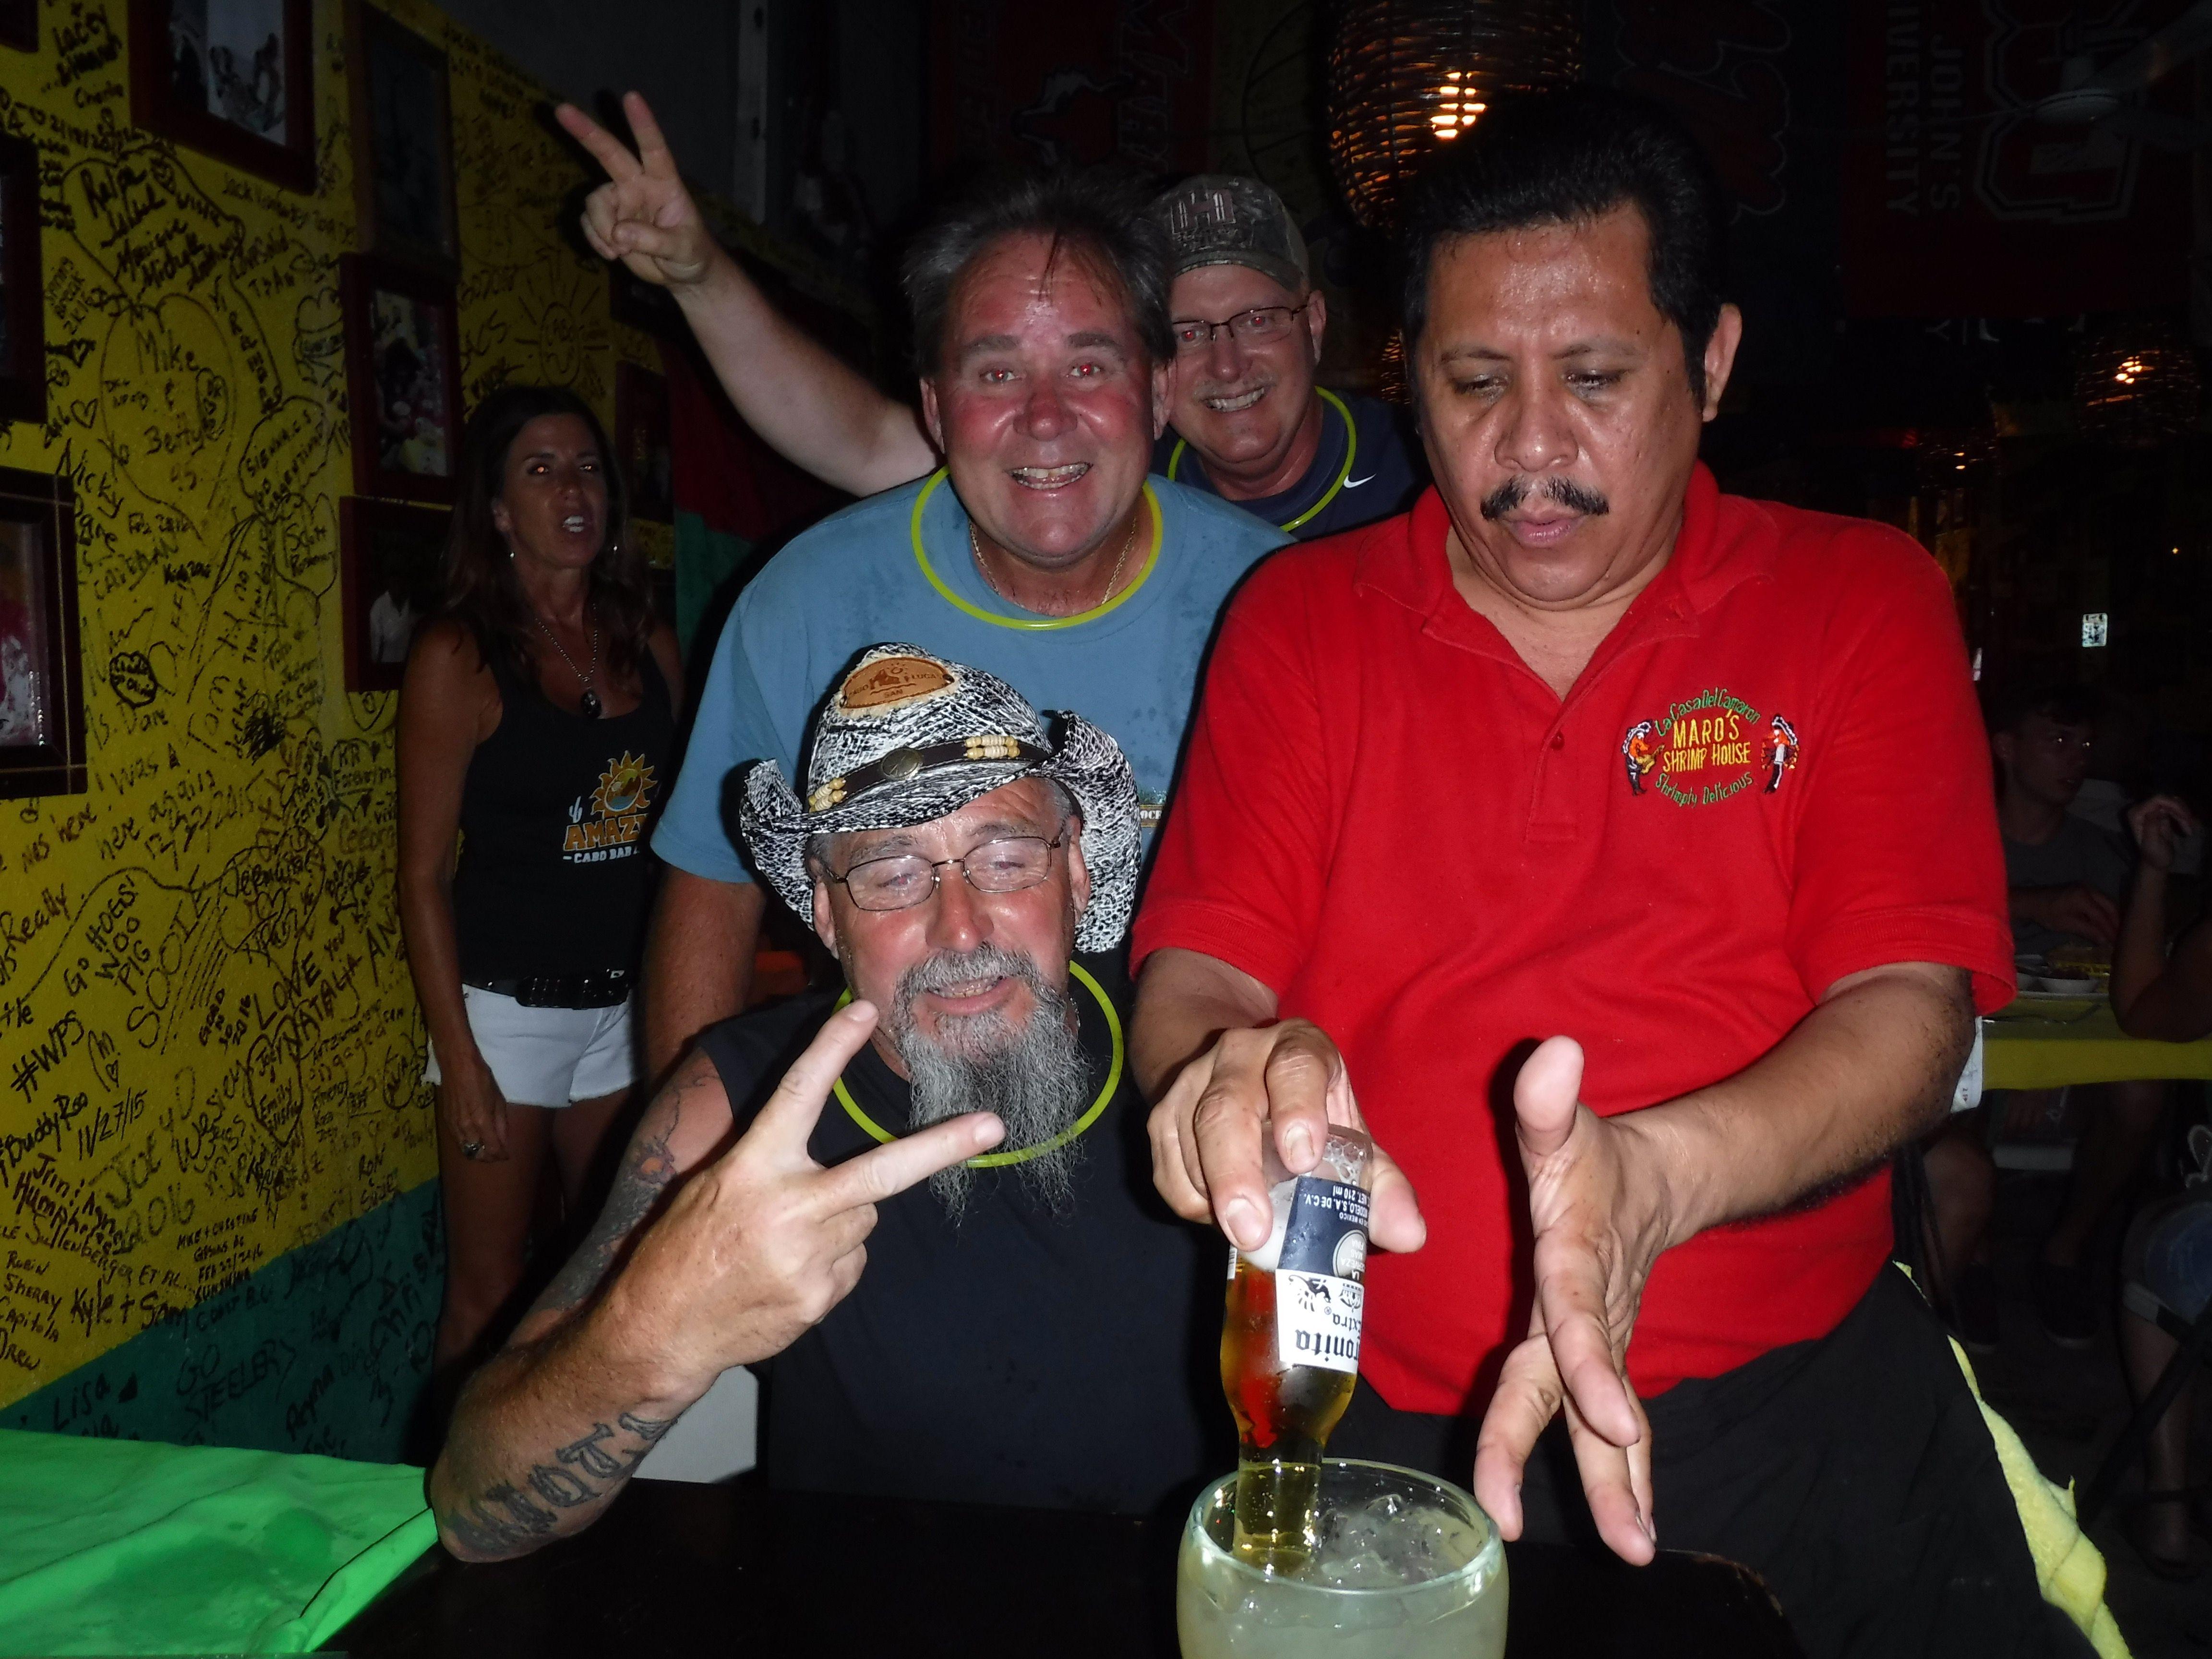 the guys fun night out! | june 2016 amazing cabo bar crawl